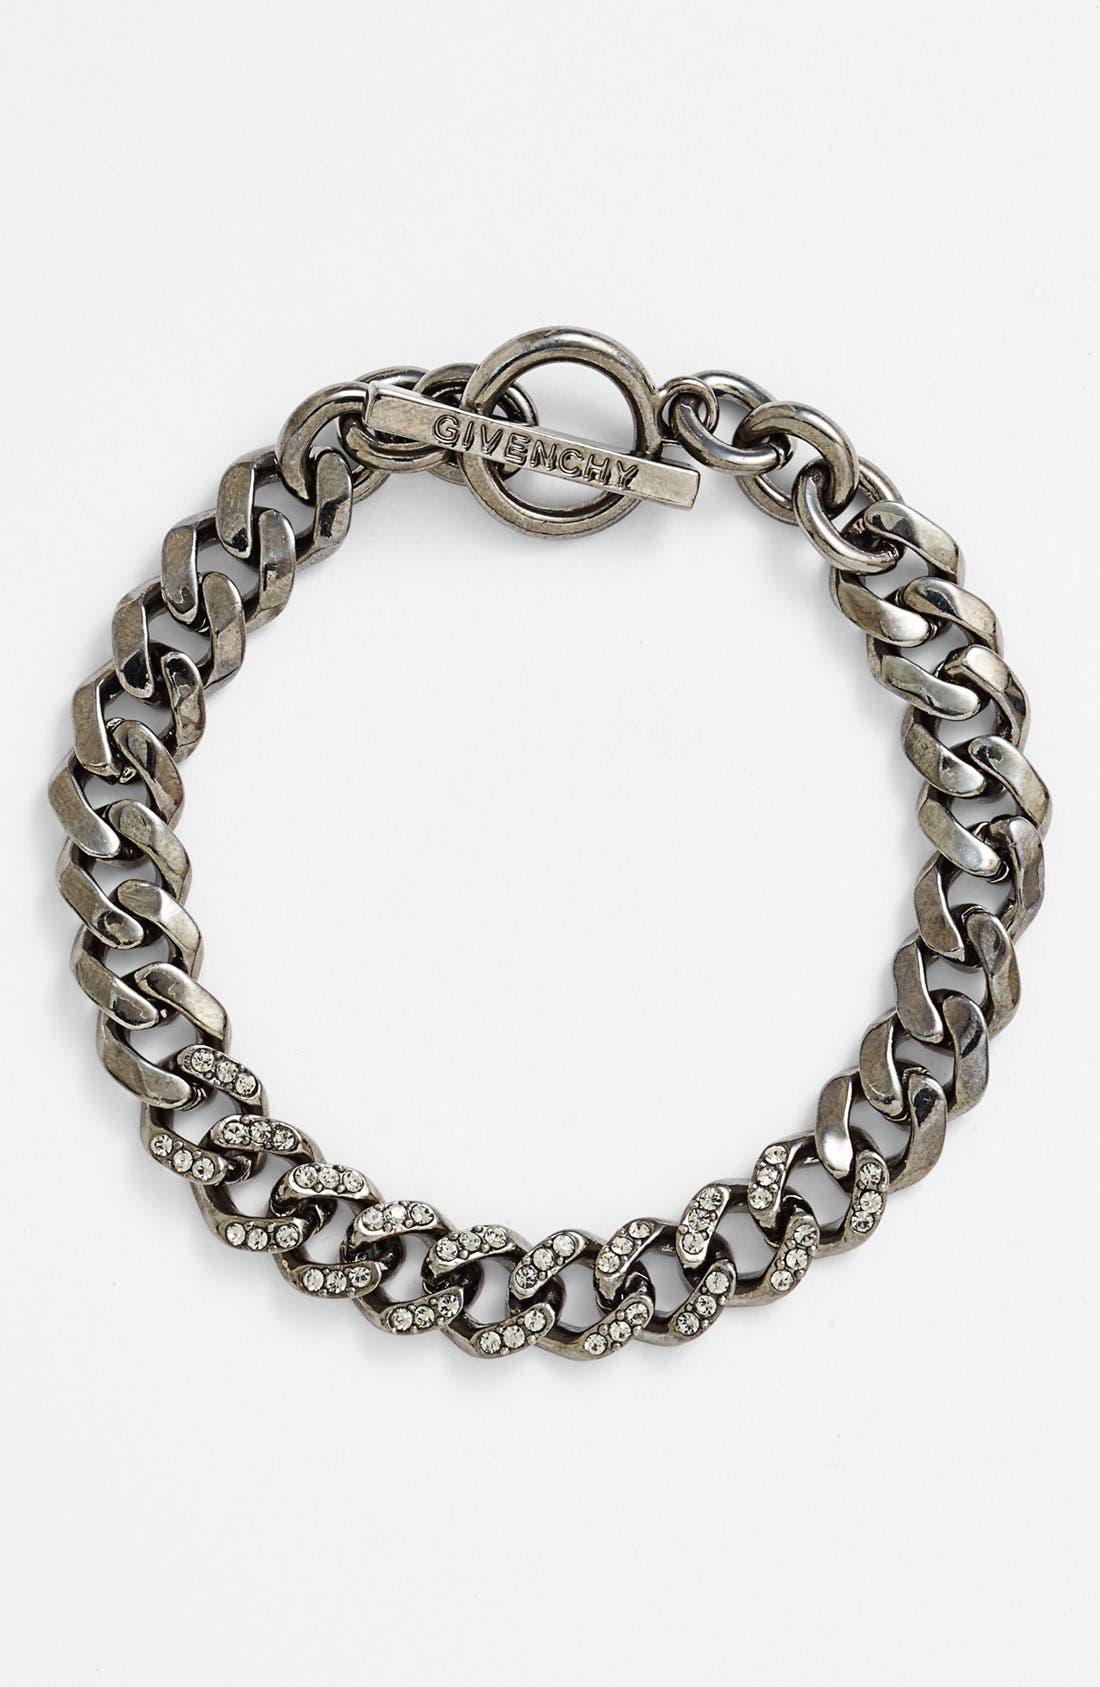 Main Image - Givenchy Pavé Chain Link Toggle Bracelet